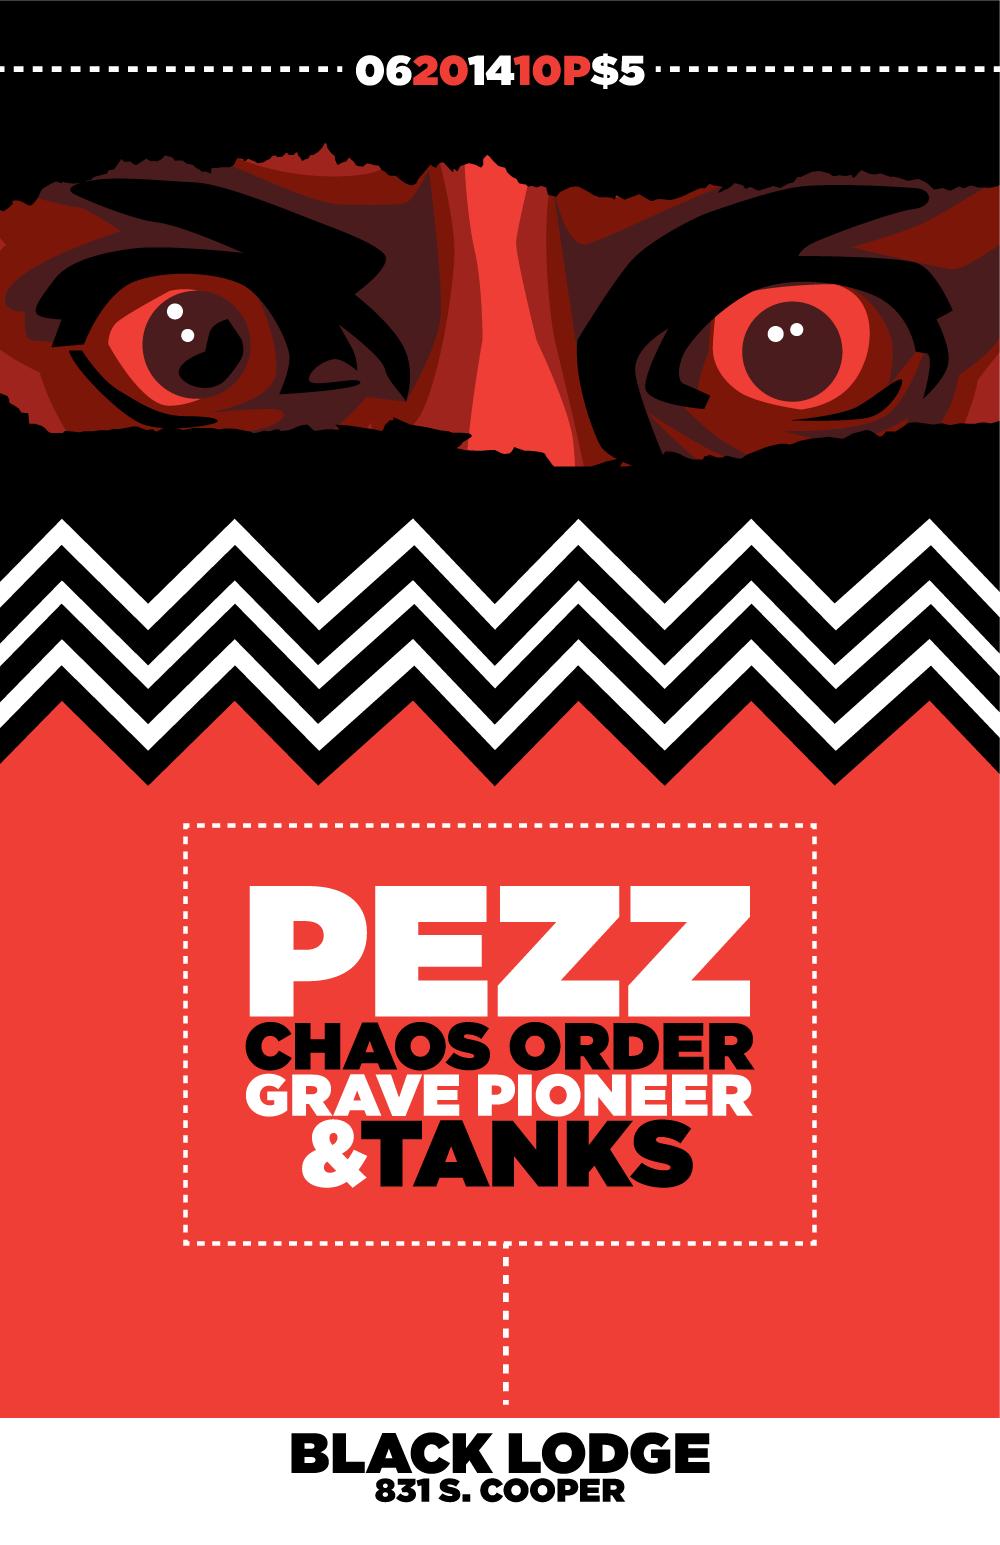 black_lodge_june202014_pezz_tanks-web.png